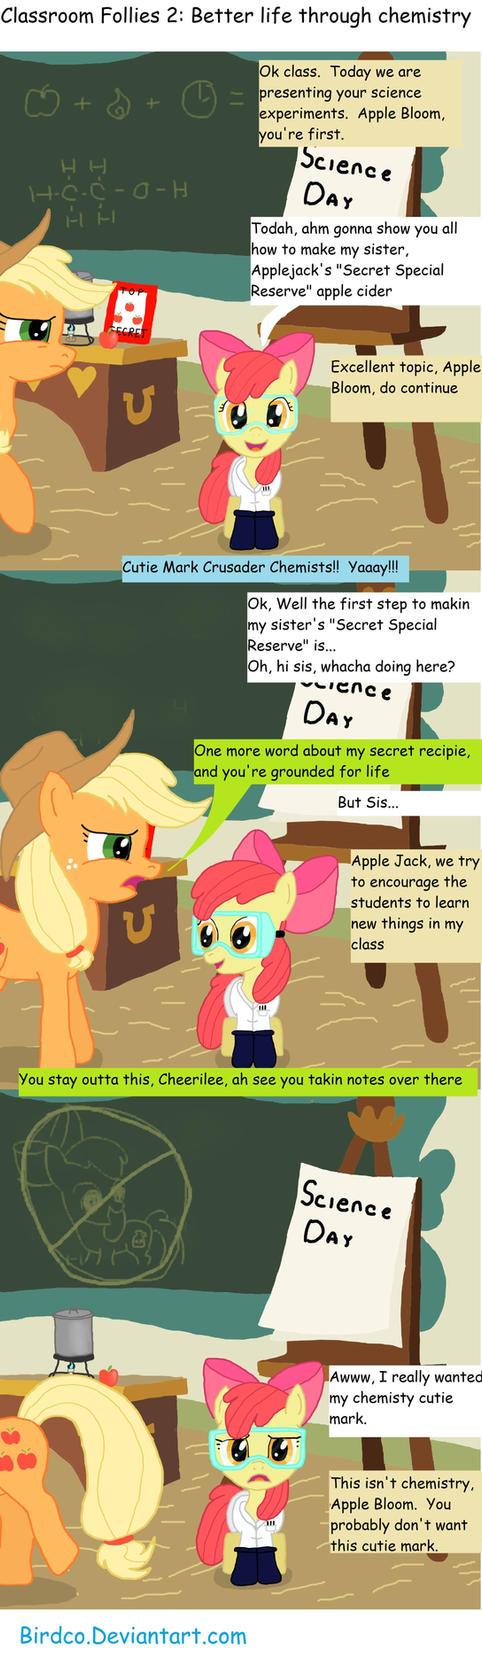 Classroom Follies 2 by Birdco